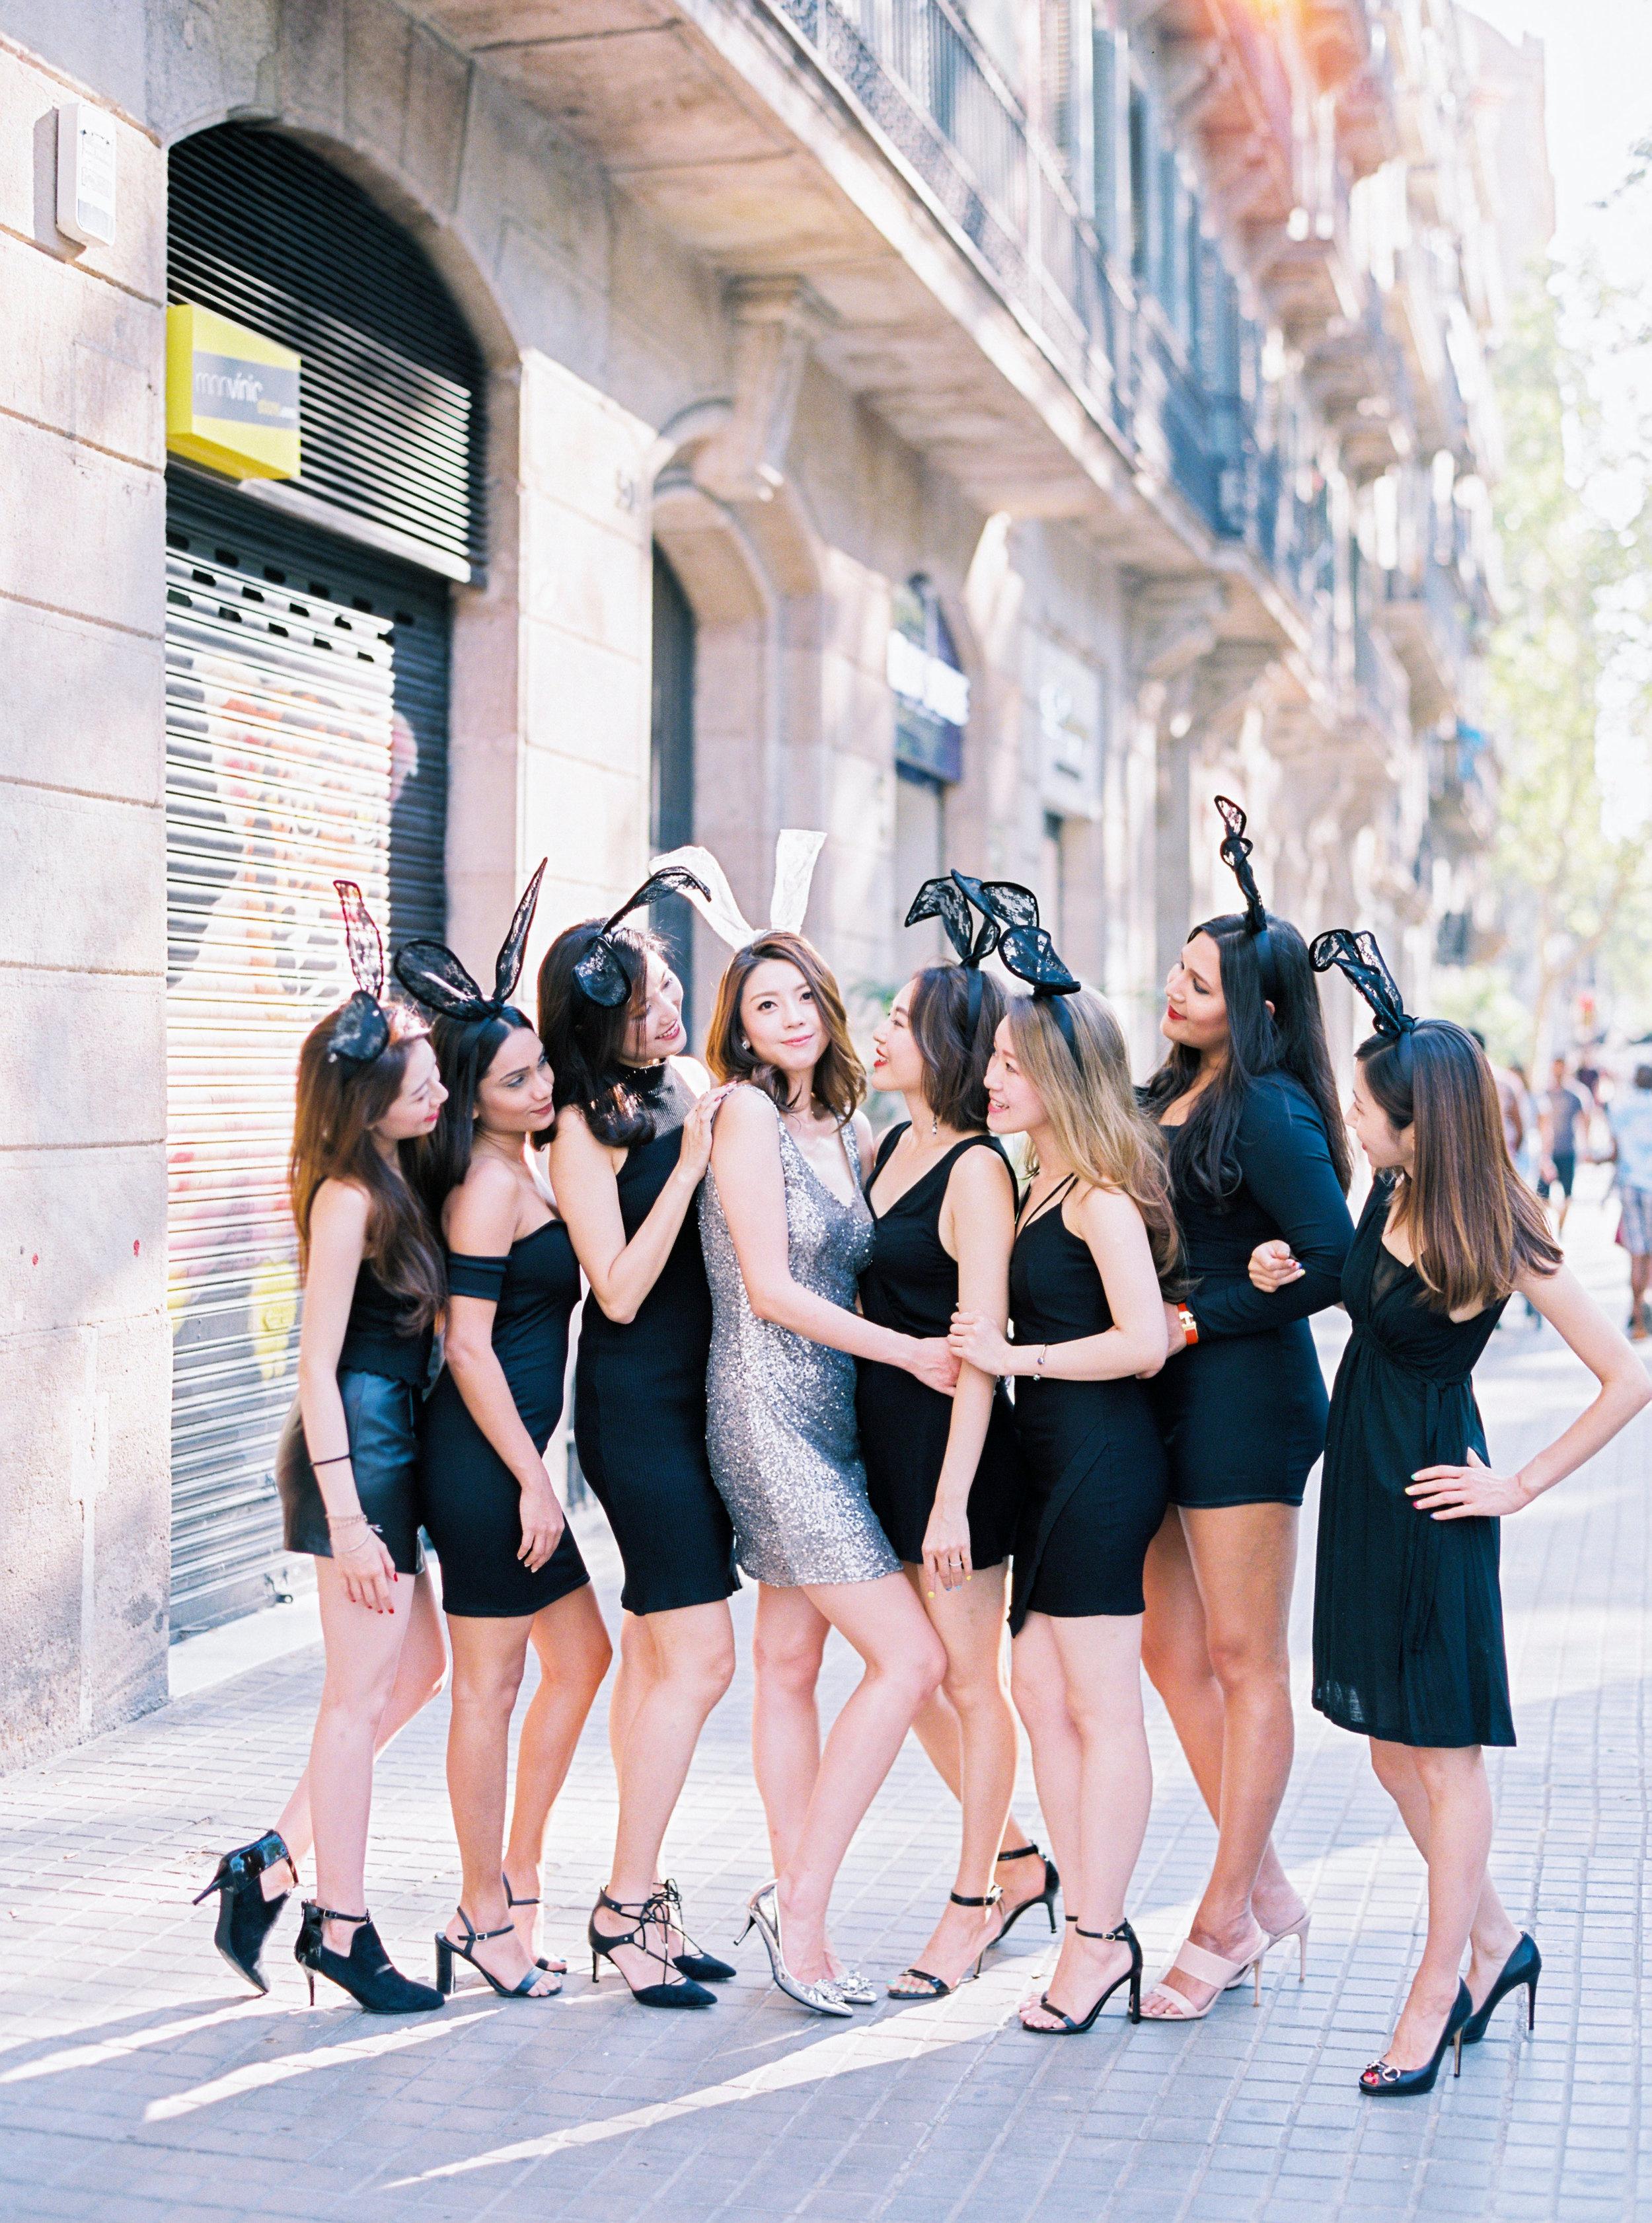 Dina-Barcelona-Le-Secret-d-Audrey_(108_of_234).jpg